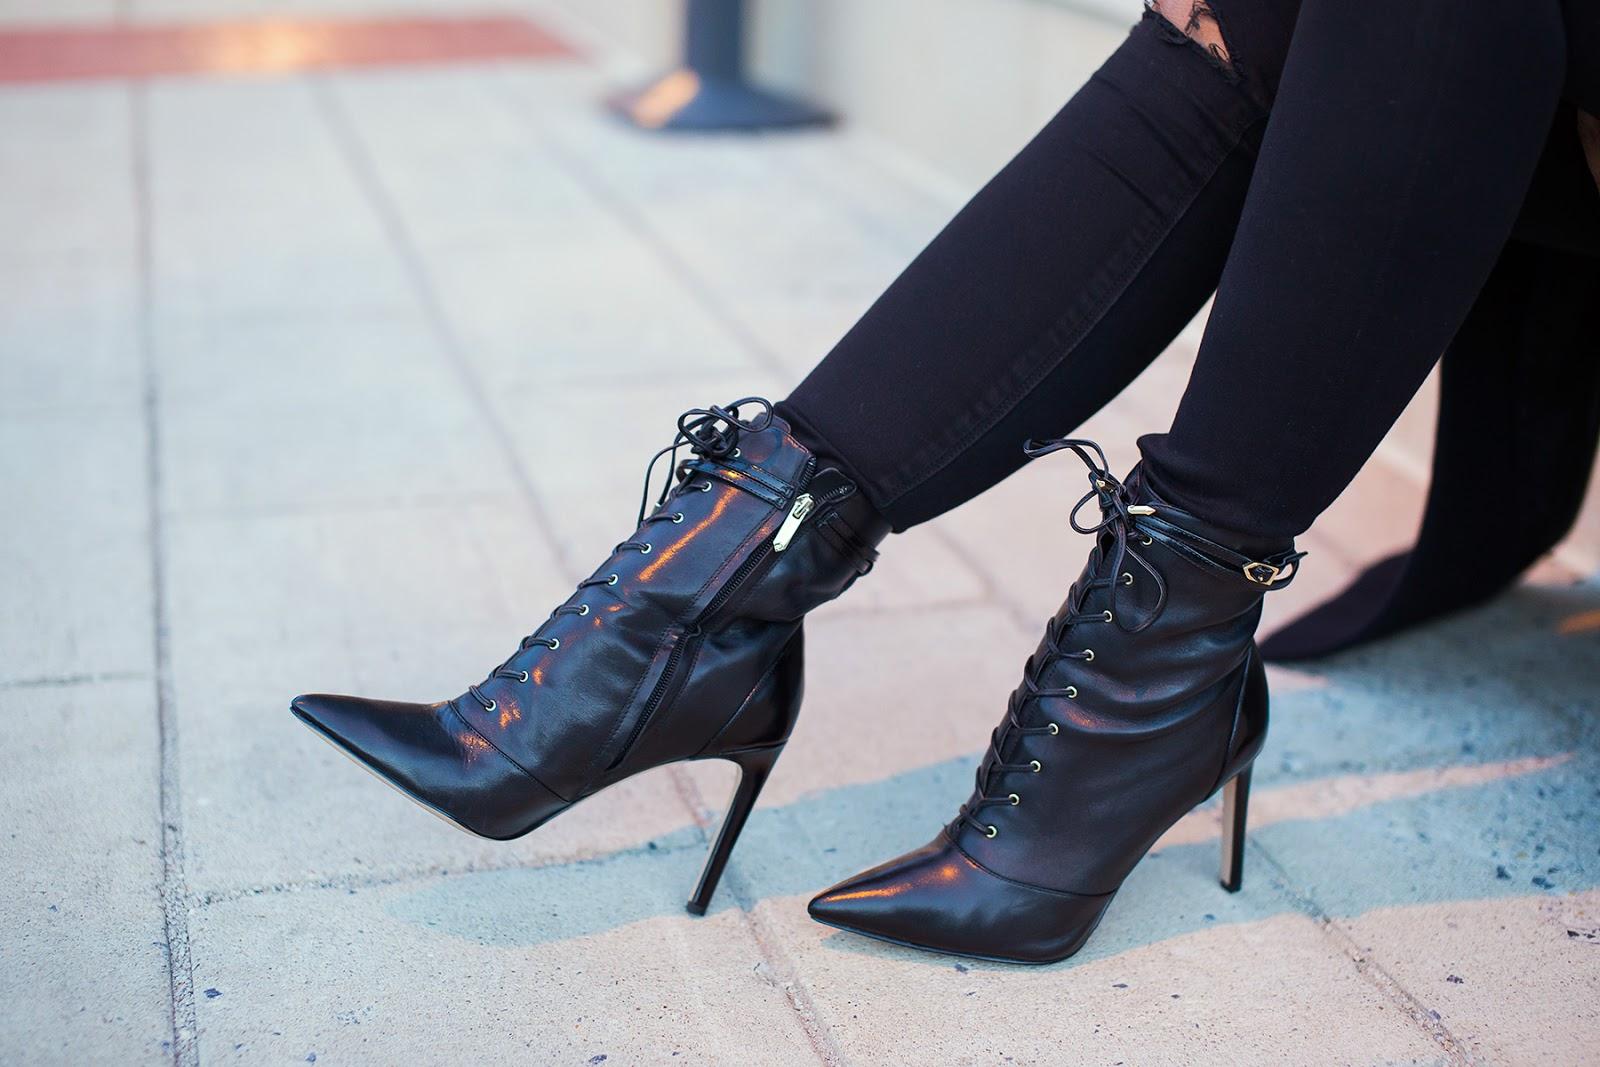 Sam edelman Bryton leather ankle boots, www.jadore-fashion.com